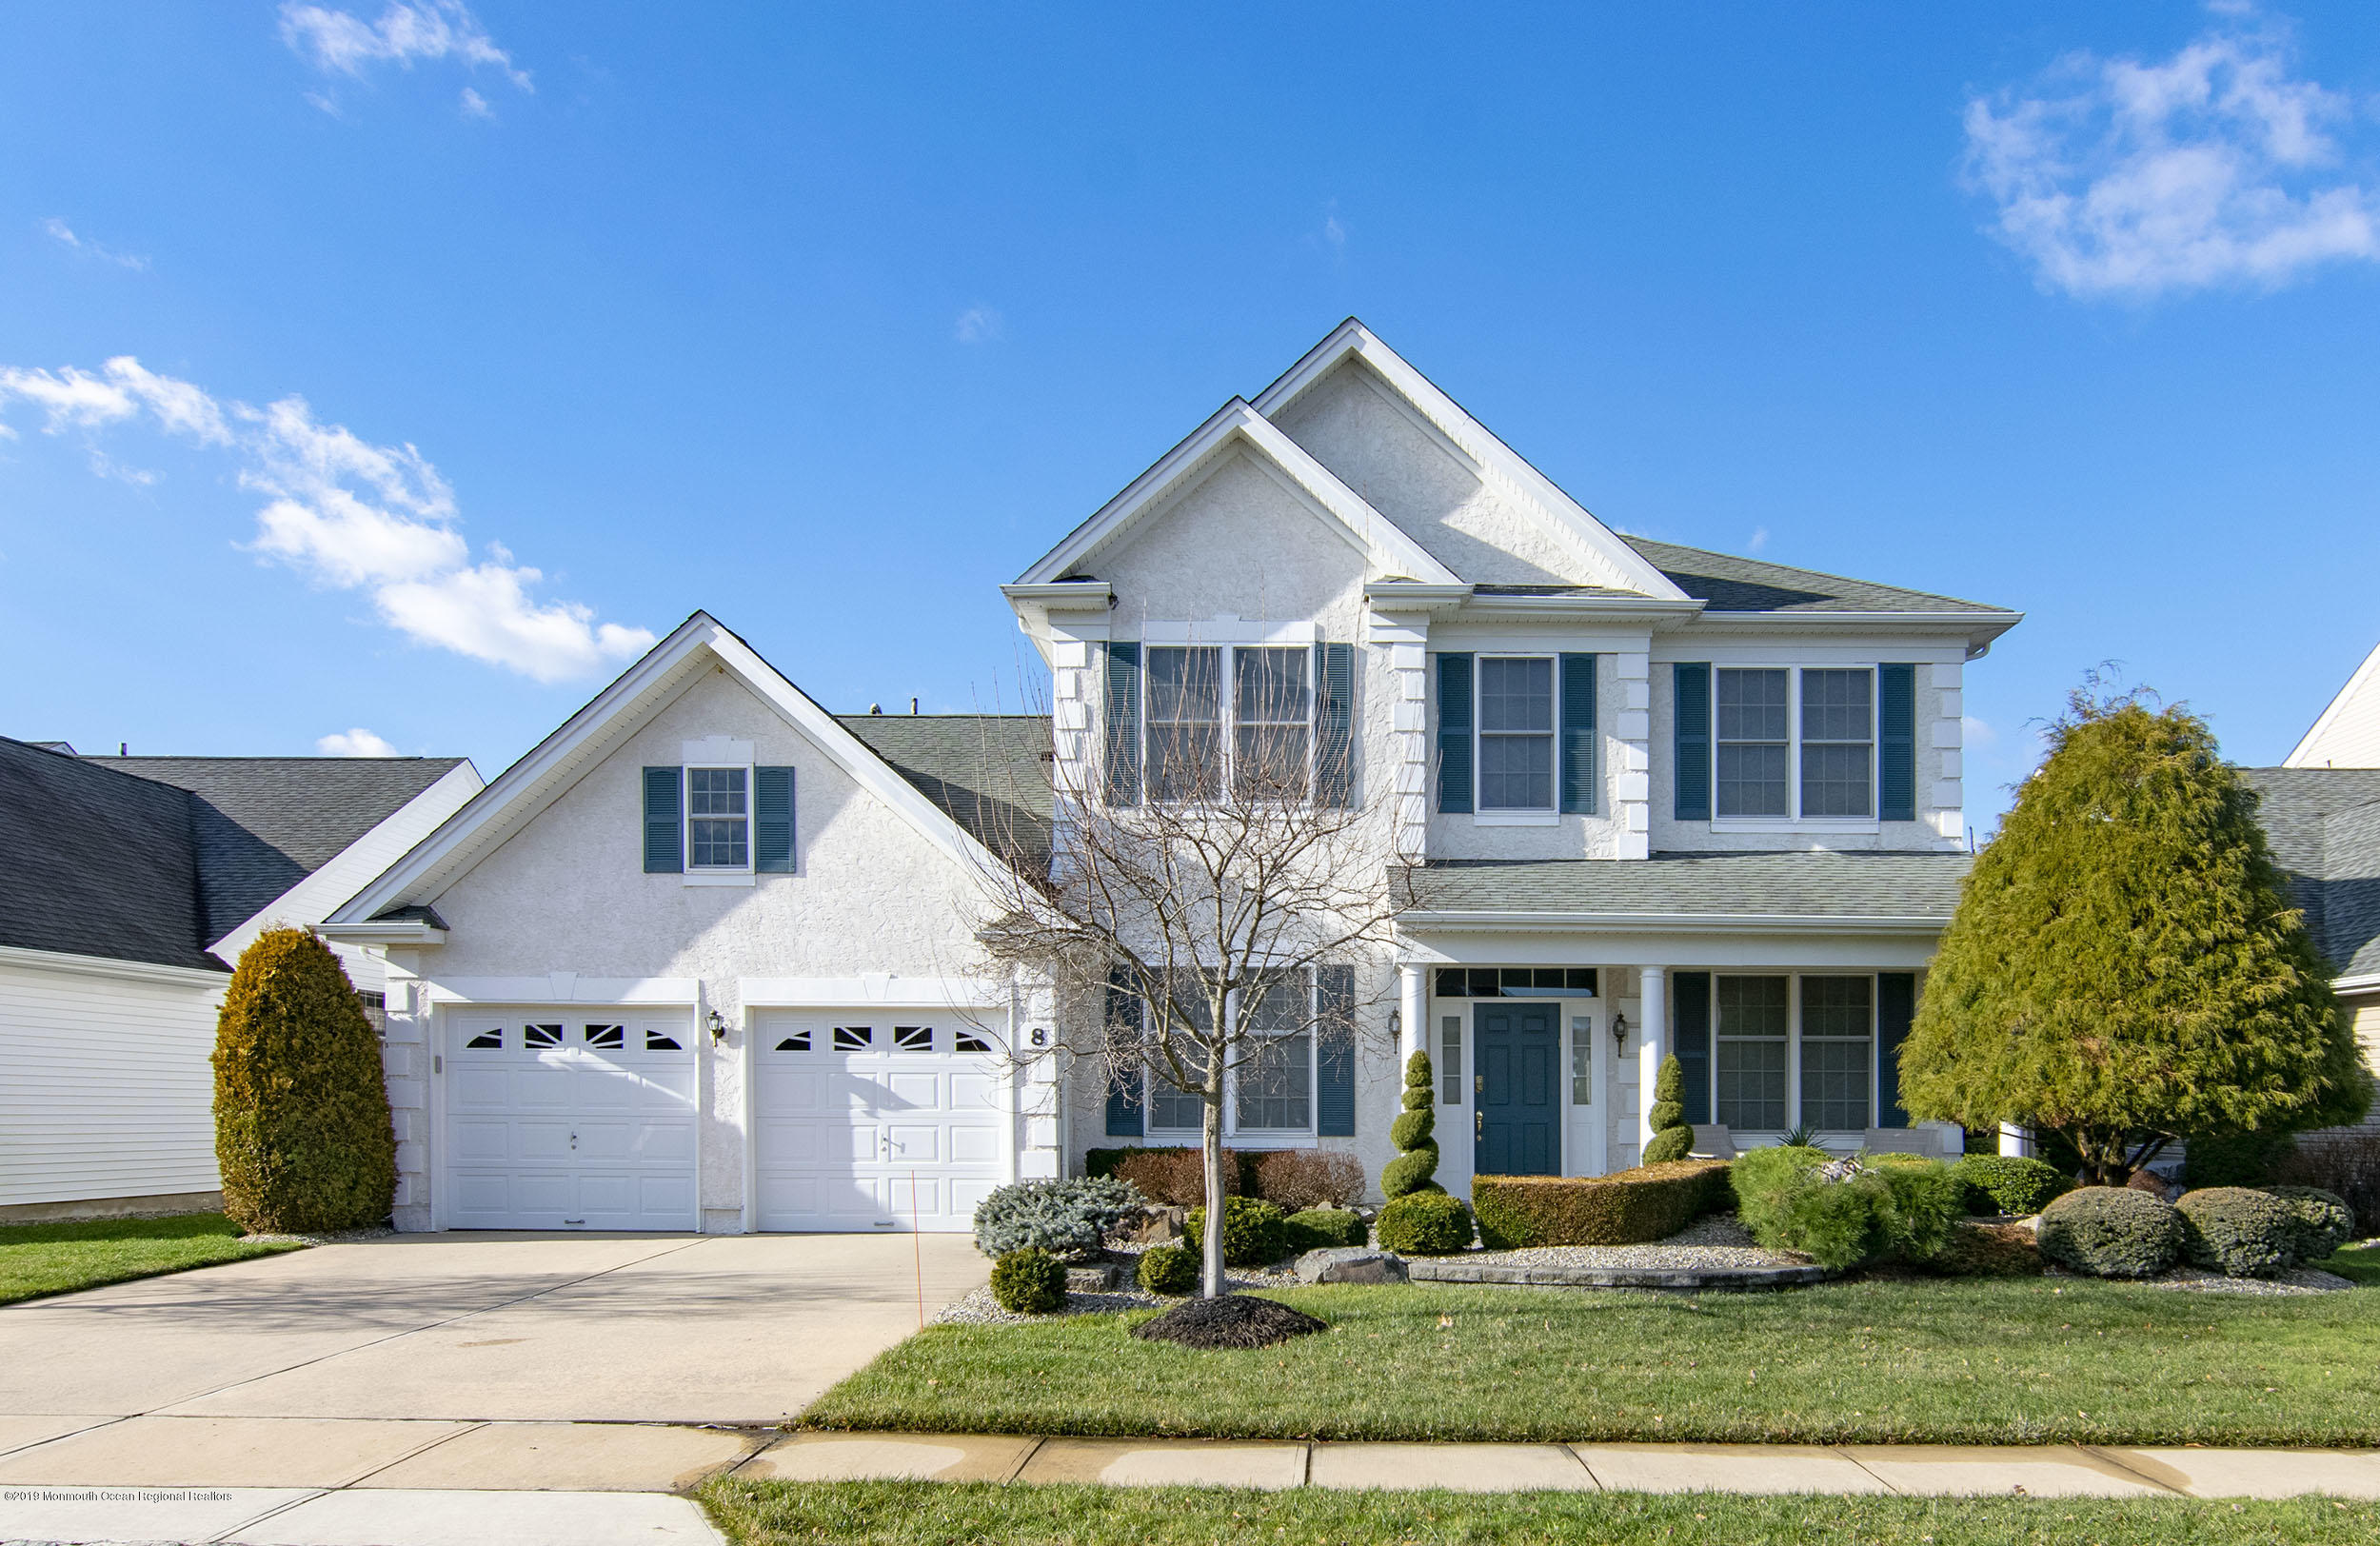 8 Attenbury Pl, Freehold, NJ 07728 - MLS 21901749 - Coldwell Banker